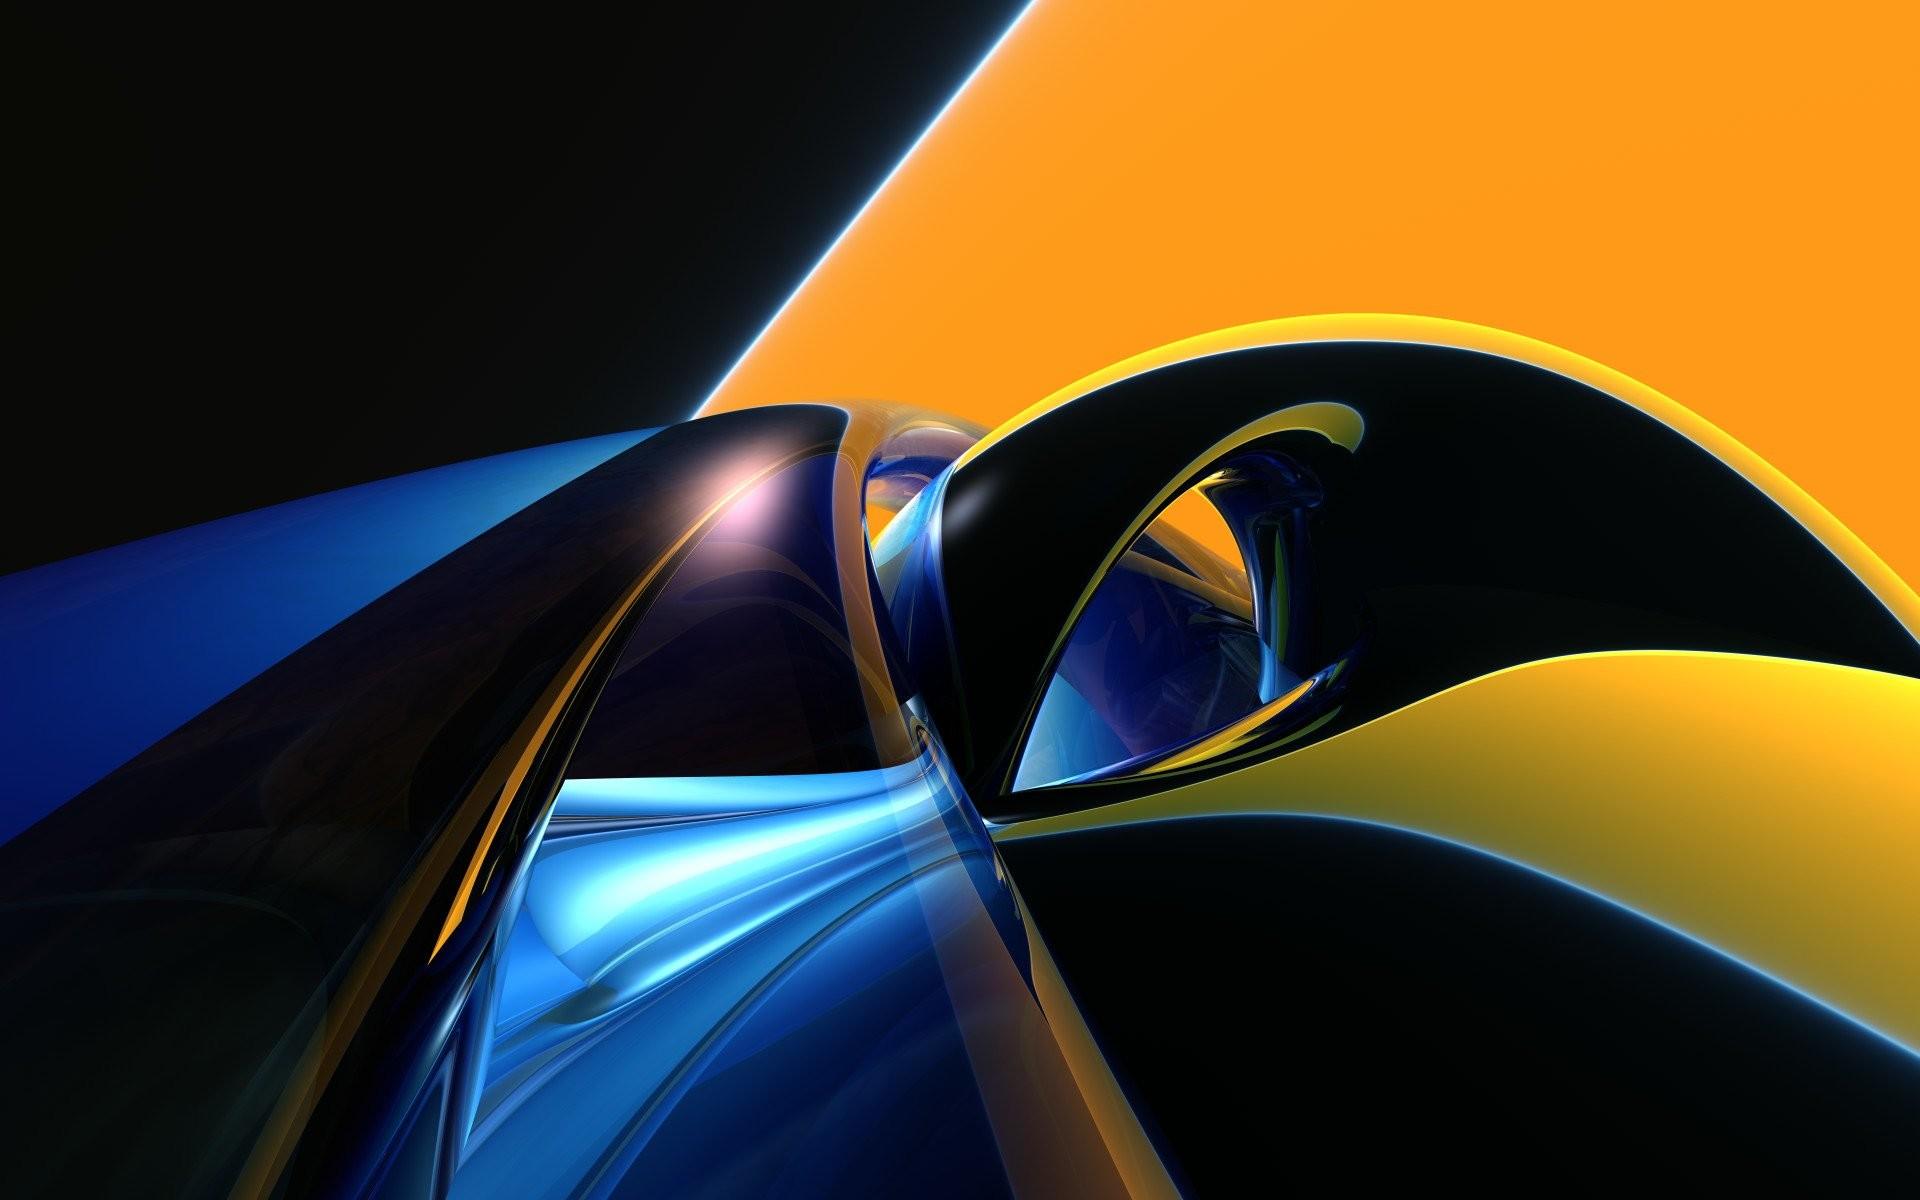 Abstract – Shapes Yellow Blue Black 3D Digital Abstract CGI Wallpaper